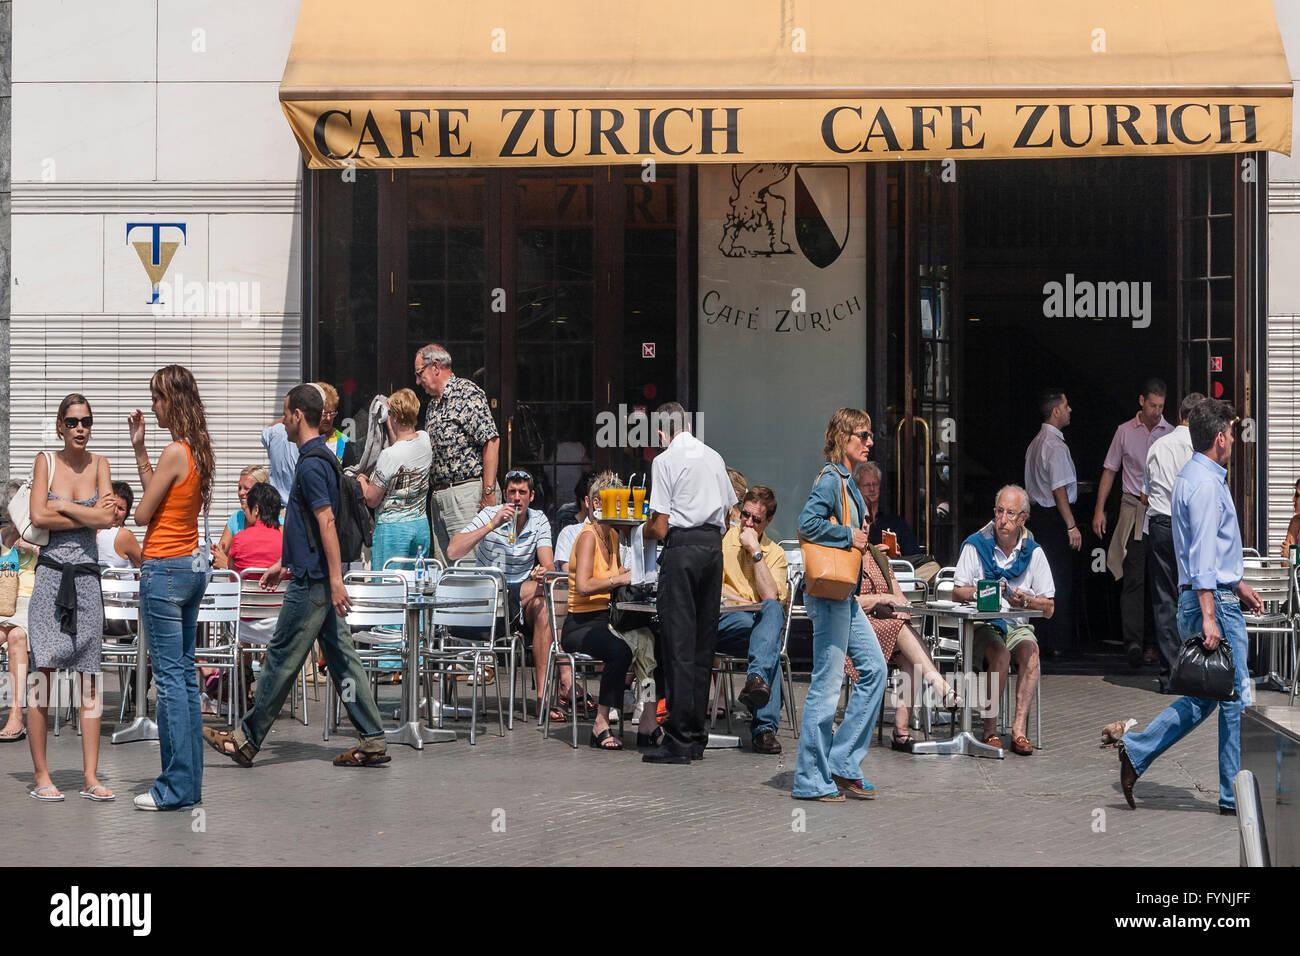 Cafe-Zürich, Steet Café, Palza de Catalunya, Barcelona Stockbild